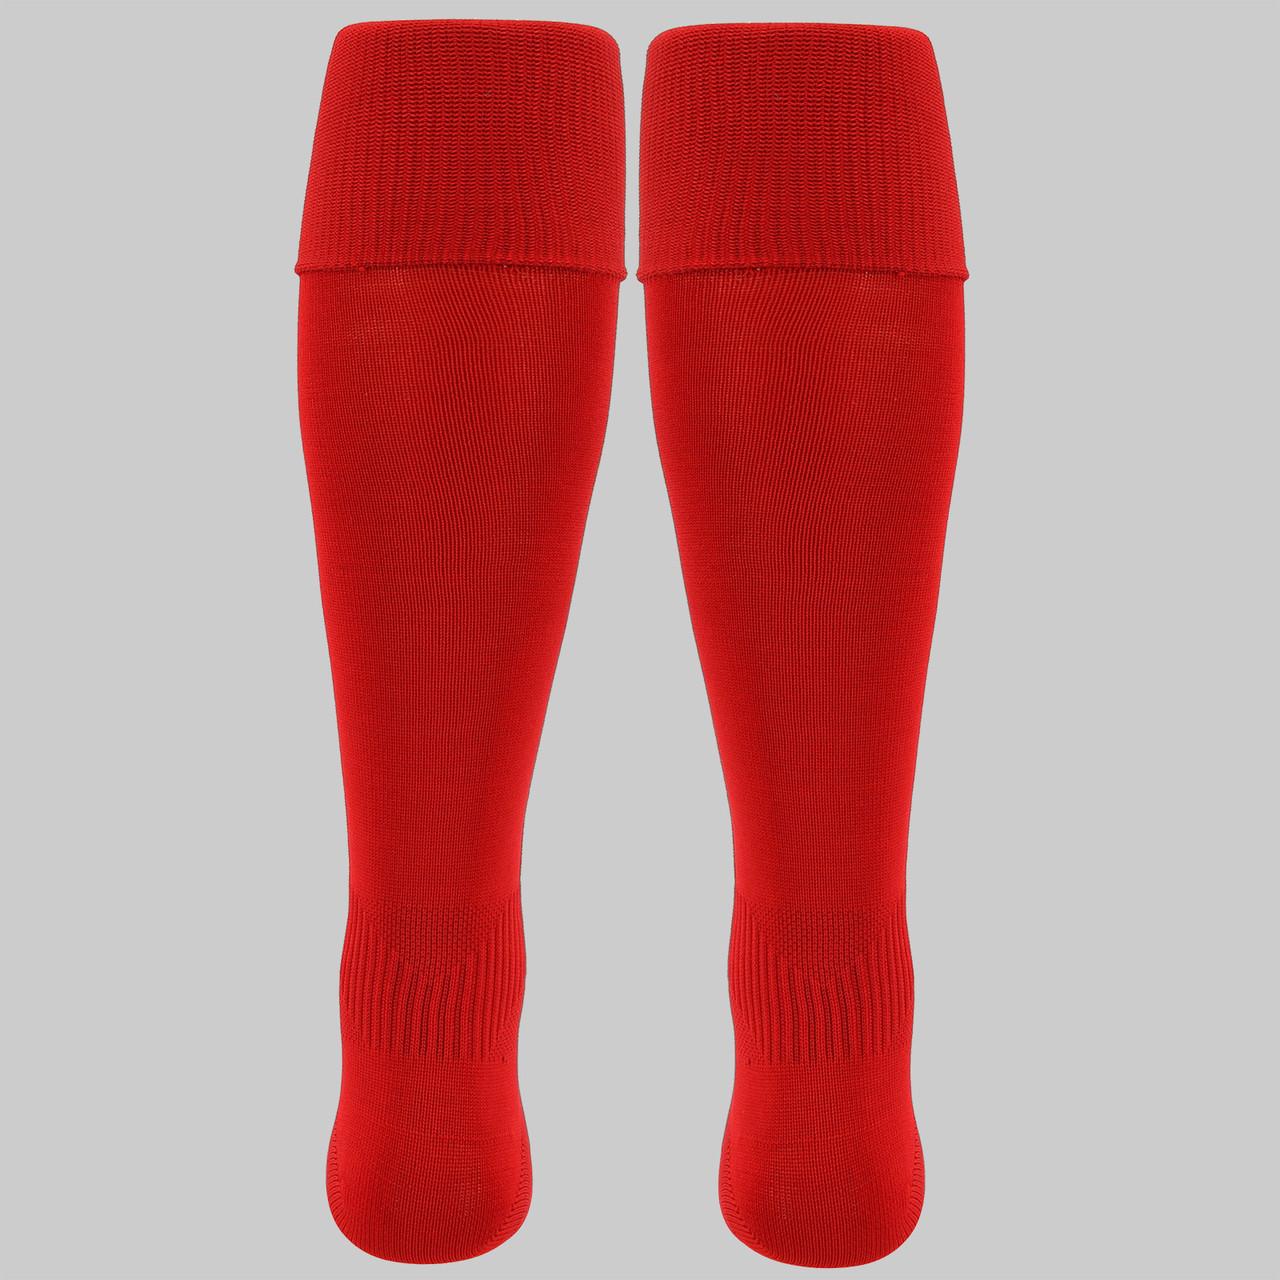 0cc015c00 ... Adidas Metro IV OTC Soccer Socks - Power Red, White, Clear Grey